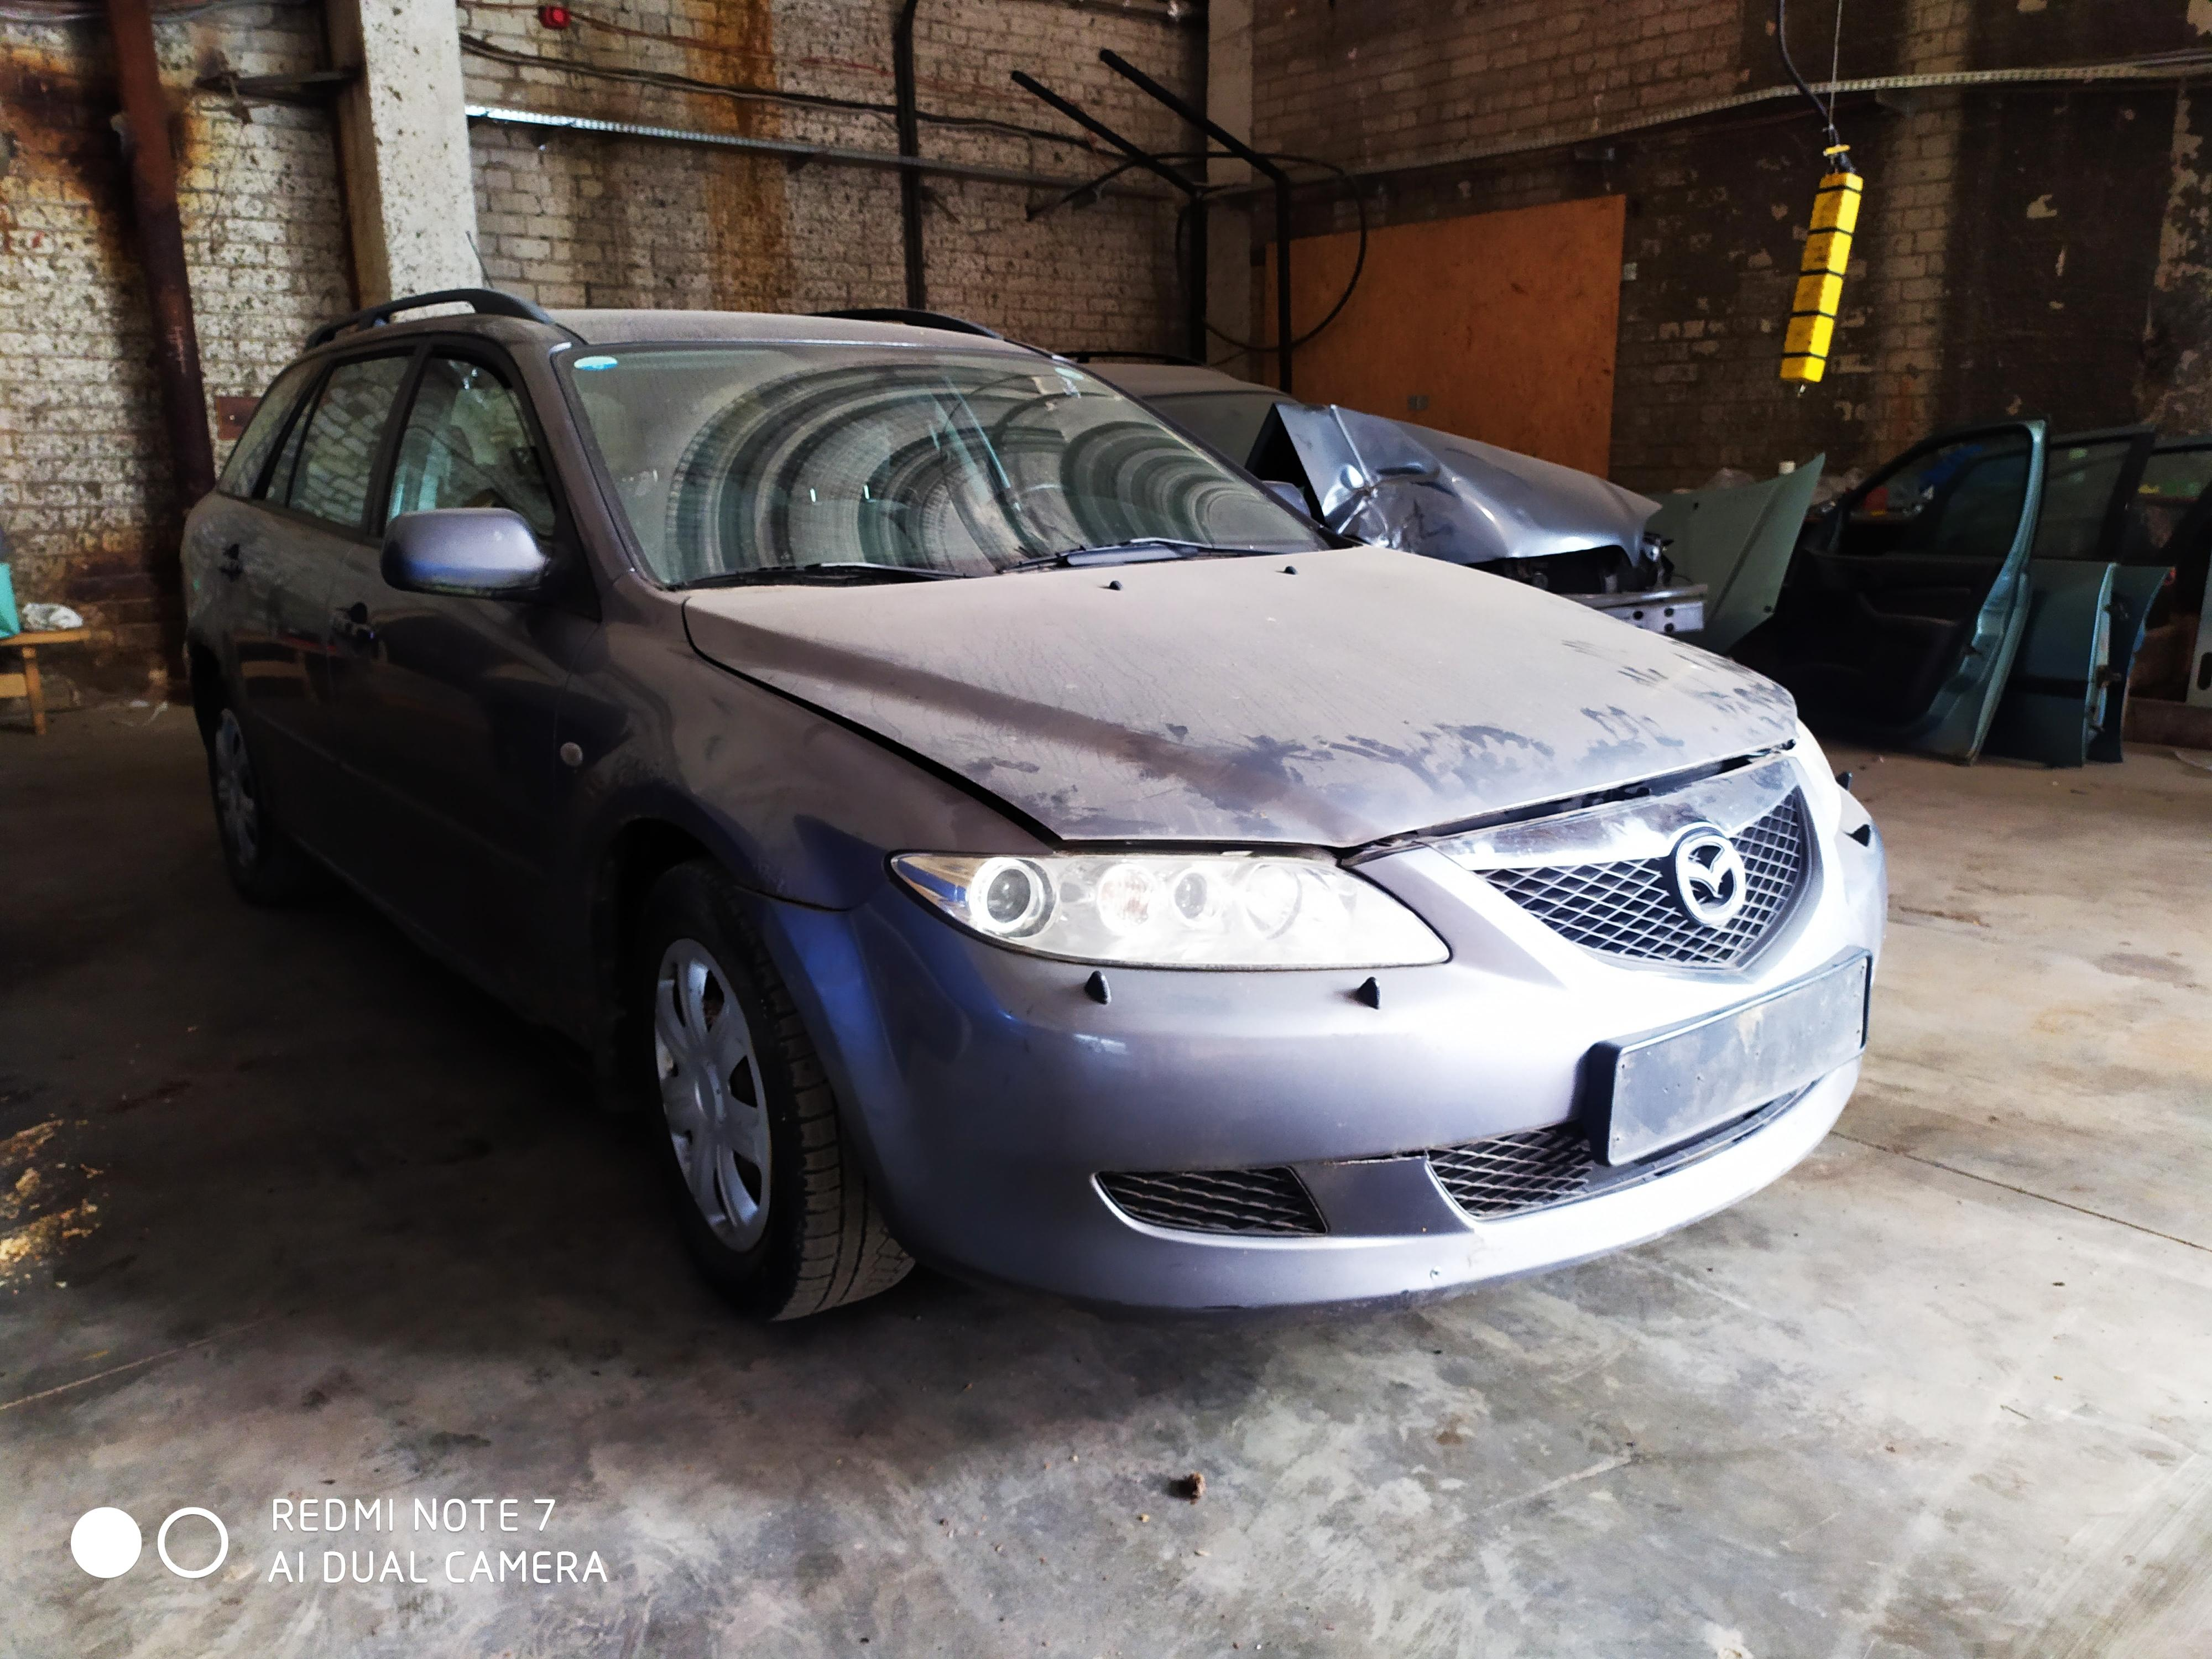 Foto-1 Mazda 6 6, 2002.06 - 2007.08 2003 Benzinas 2.0